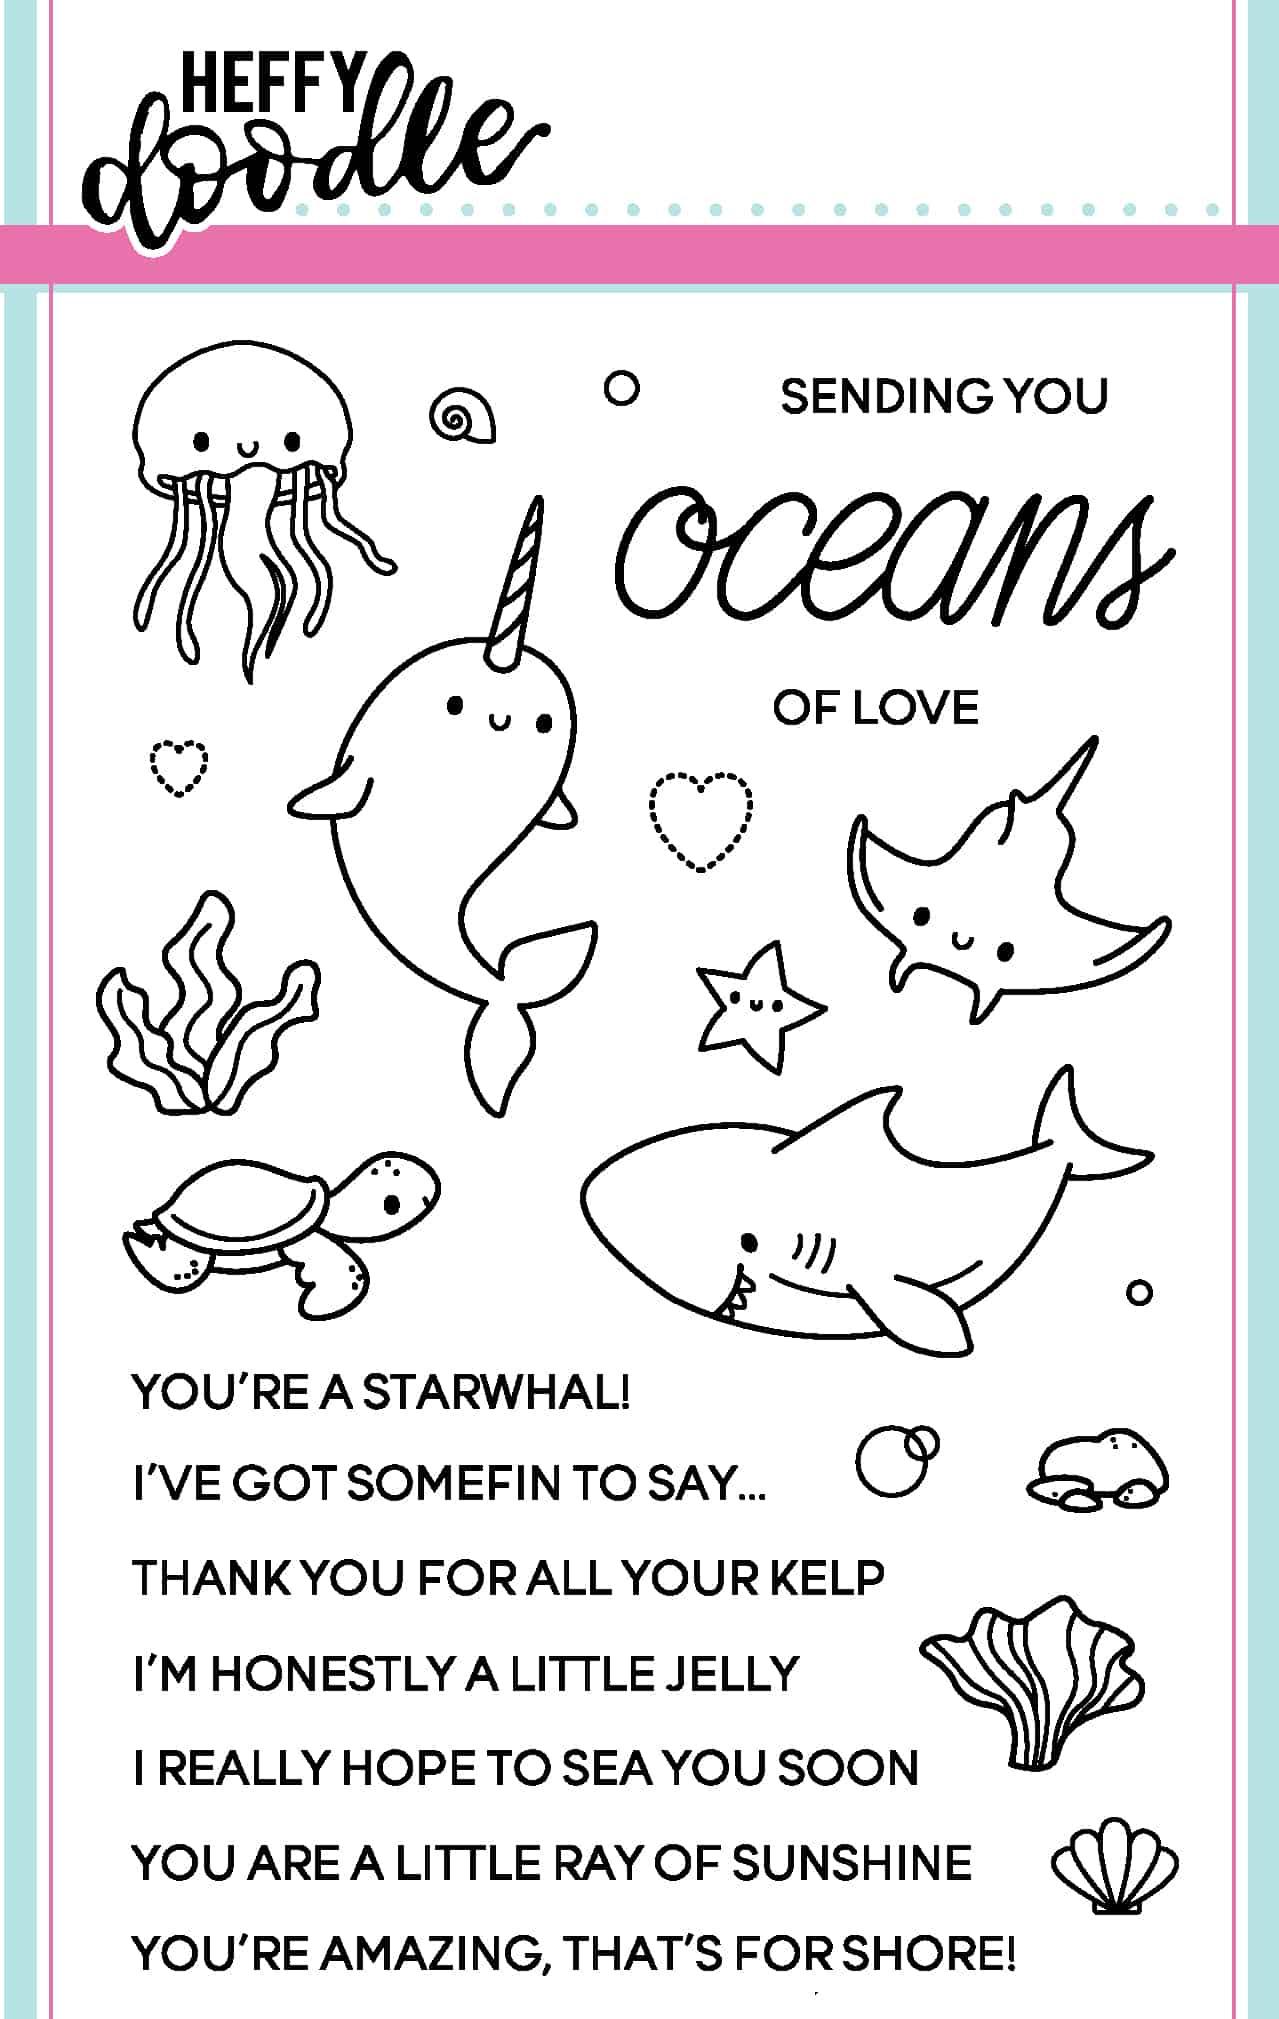 Heffy Doodle Clear Stamp Set: Oceans of Love